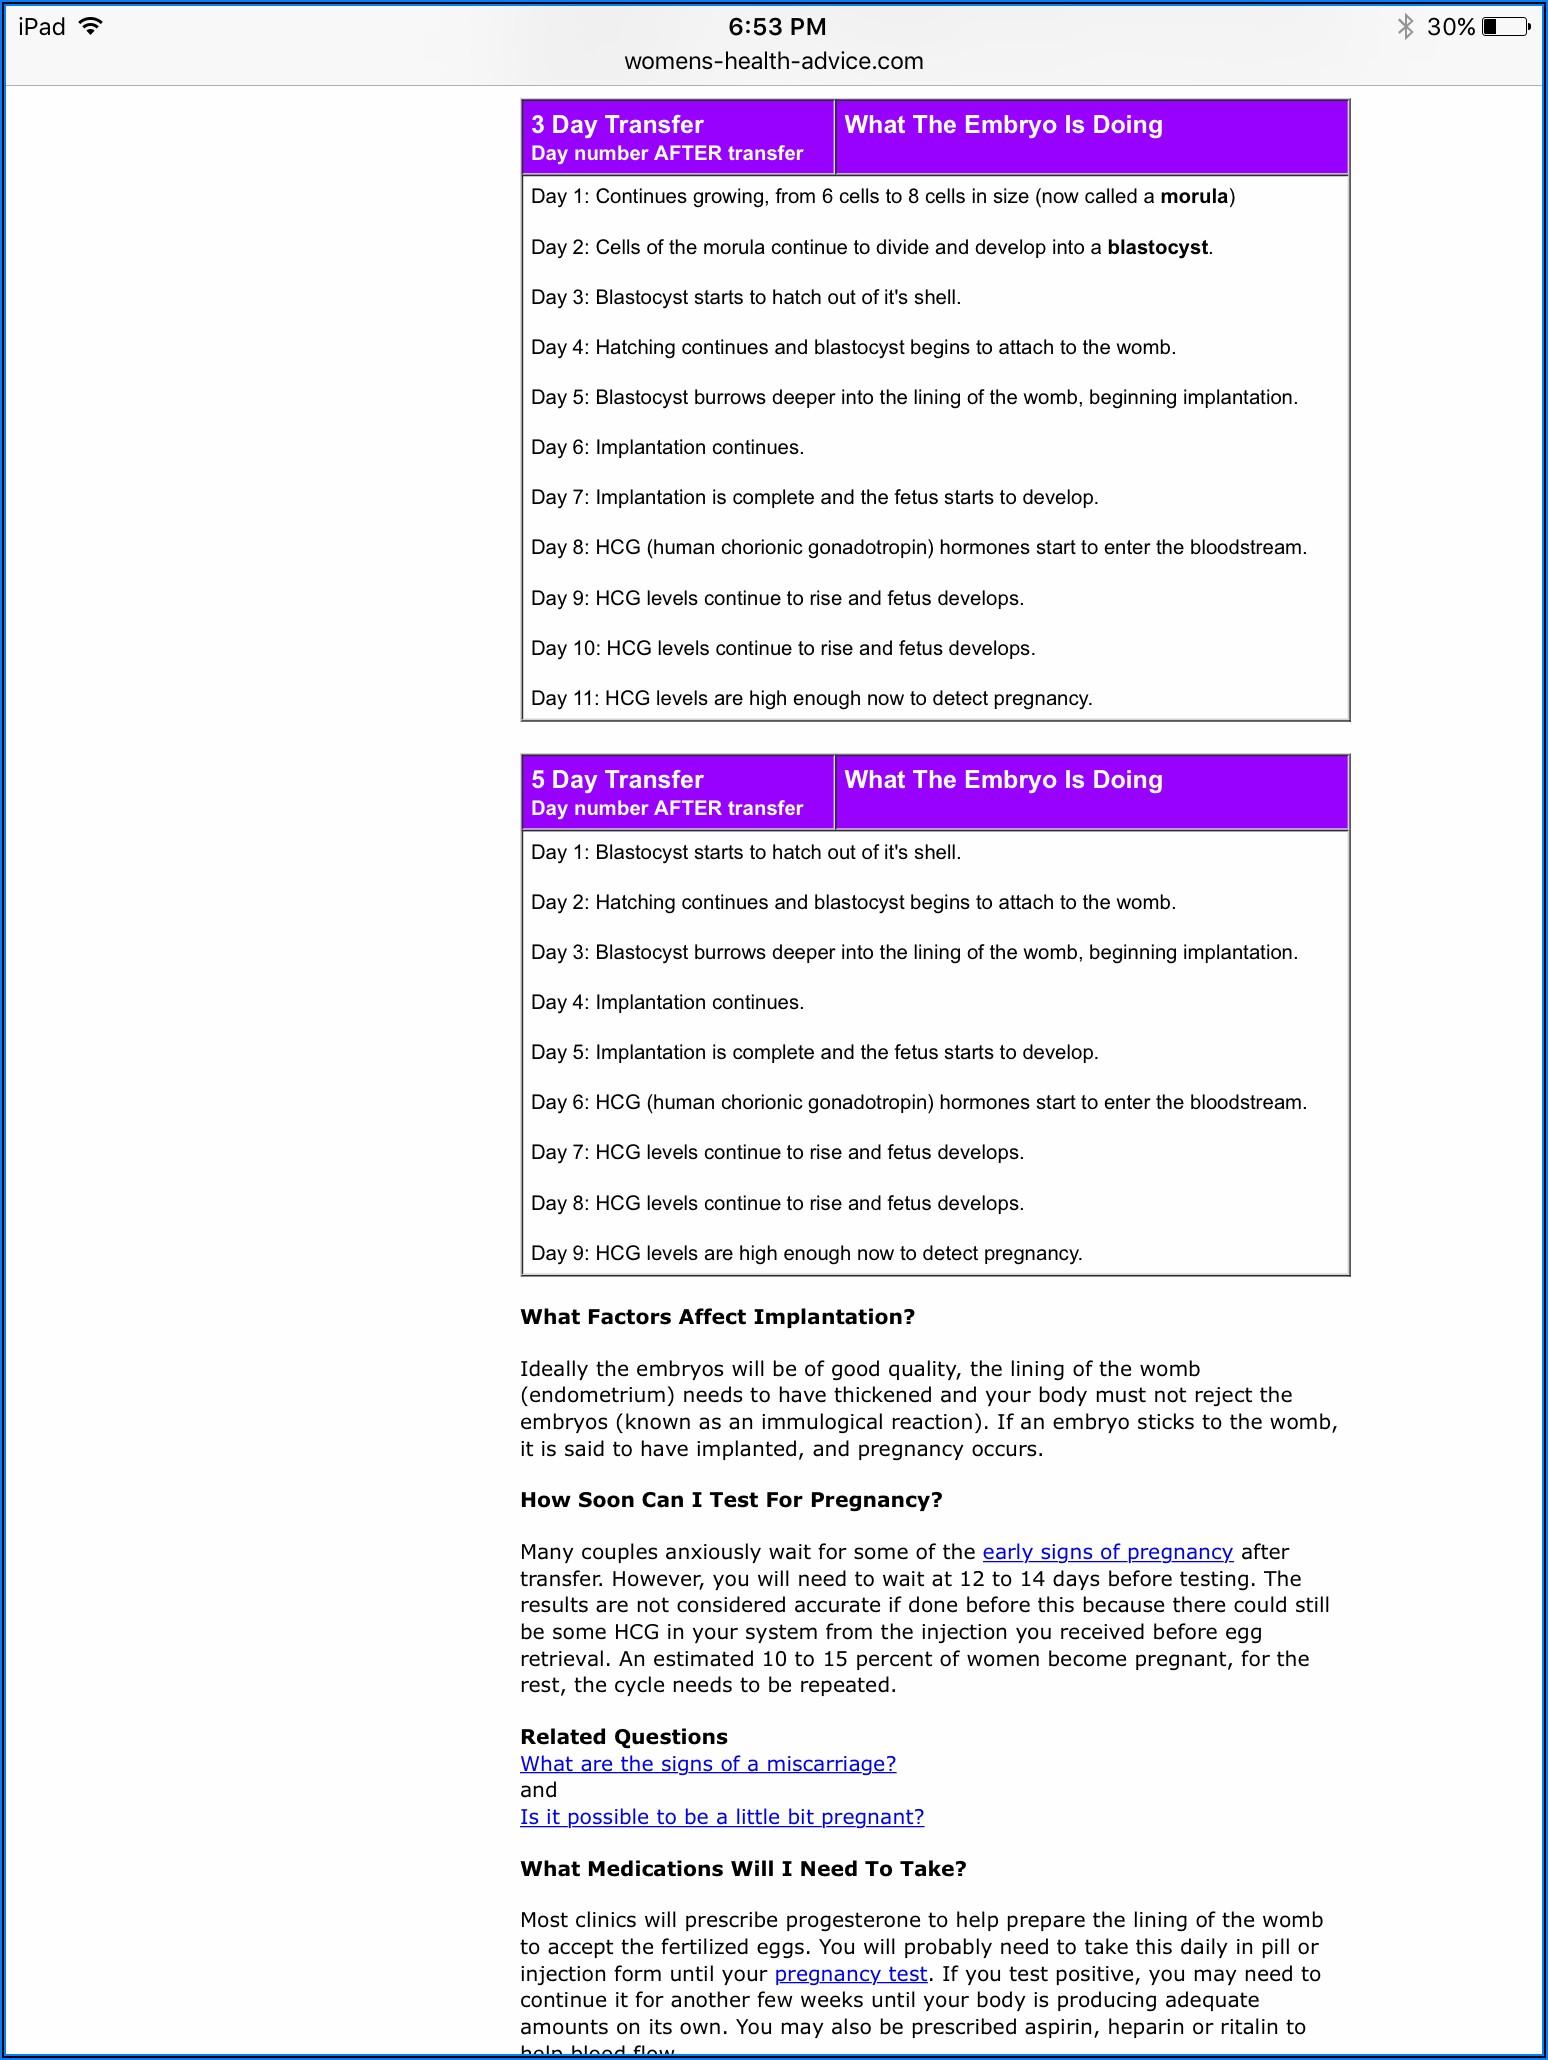 5 Day Blastocyst Implantation Timeline Ivf